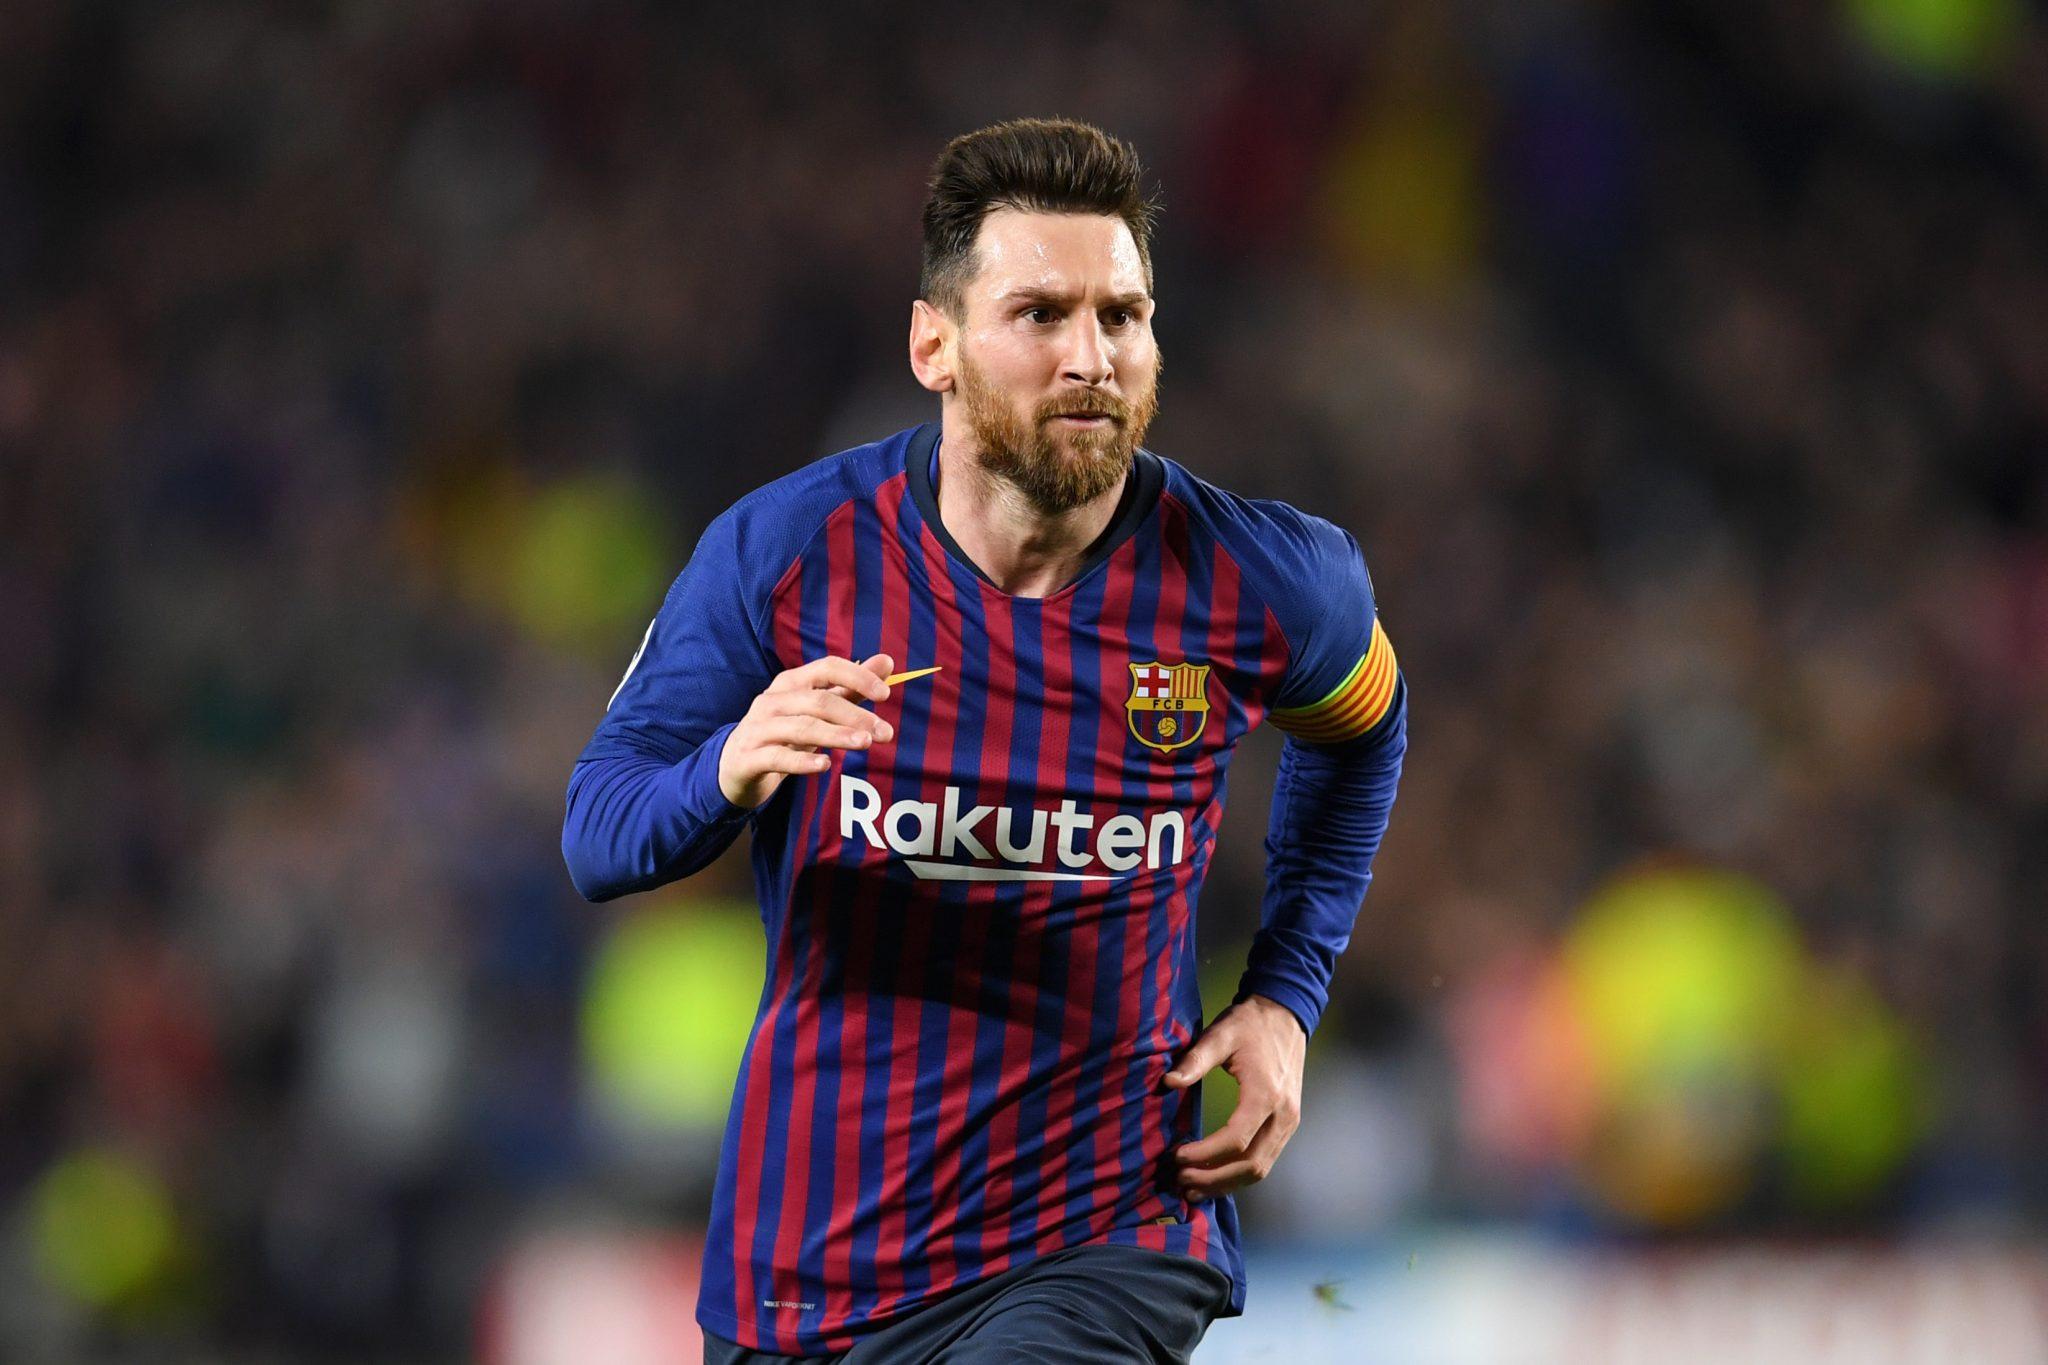 Fussballer Messi